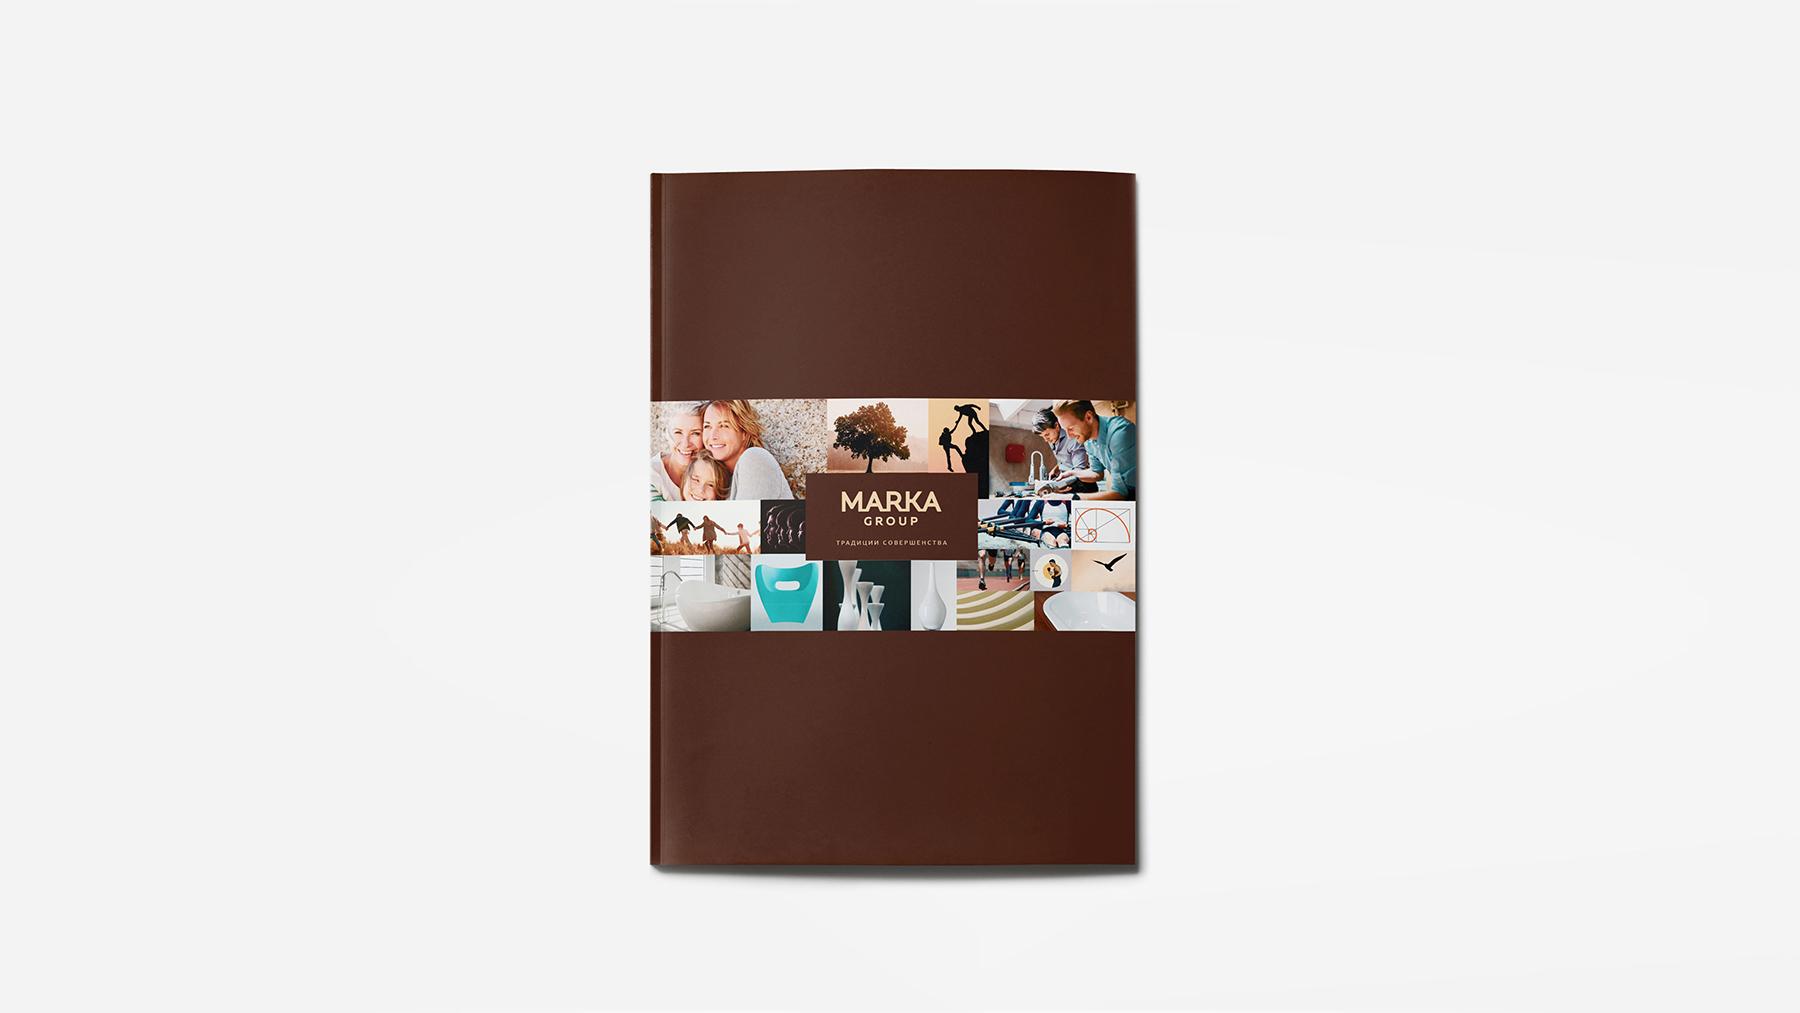 Marka Group - Kima